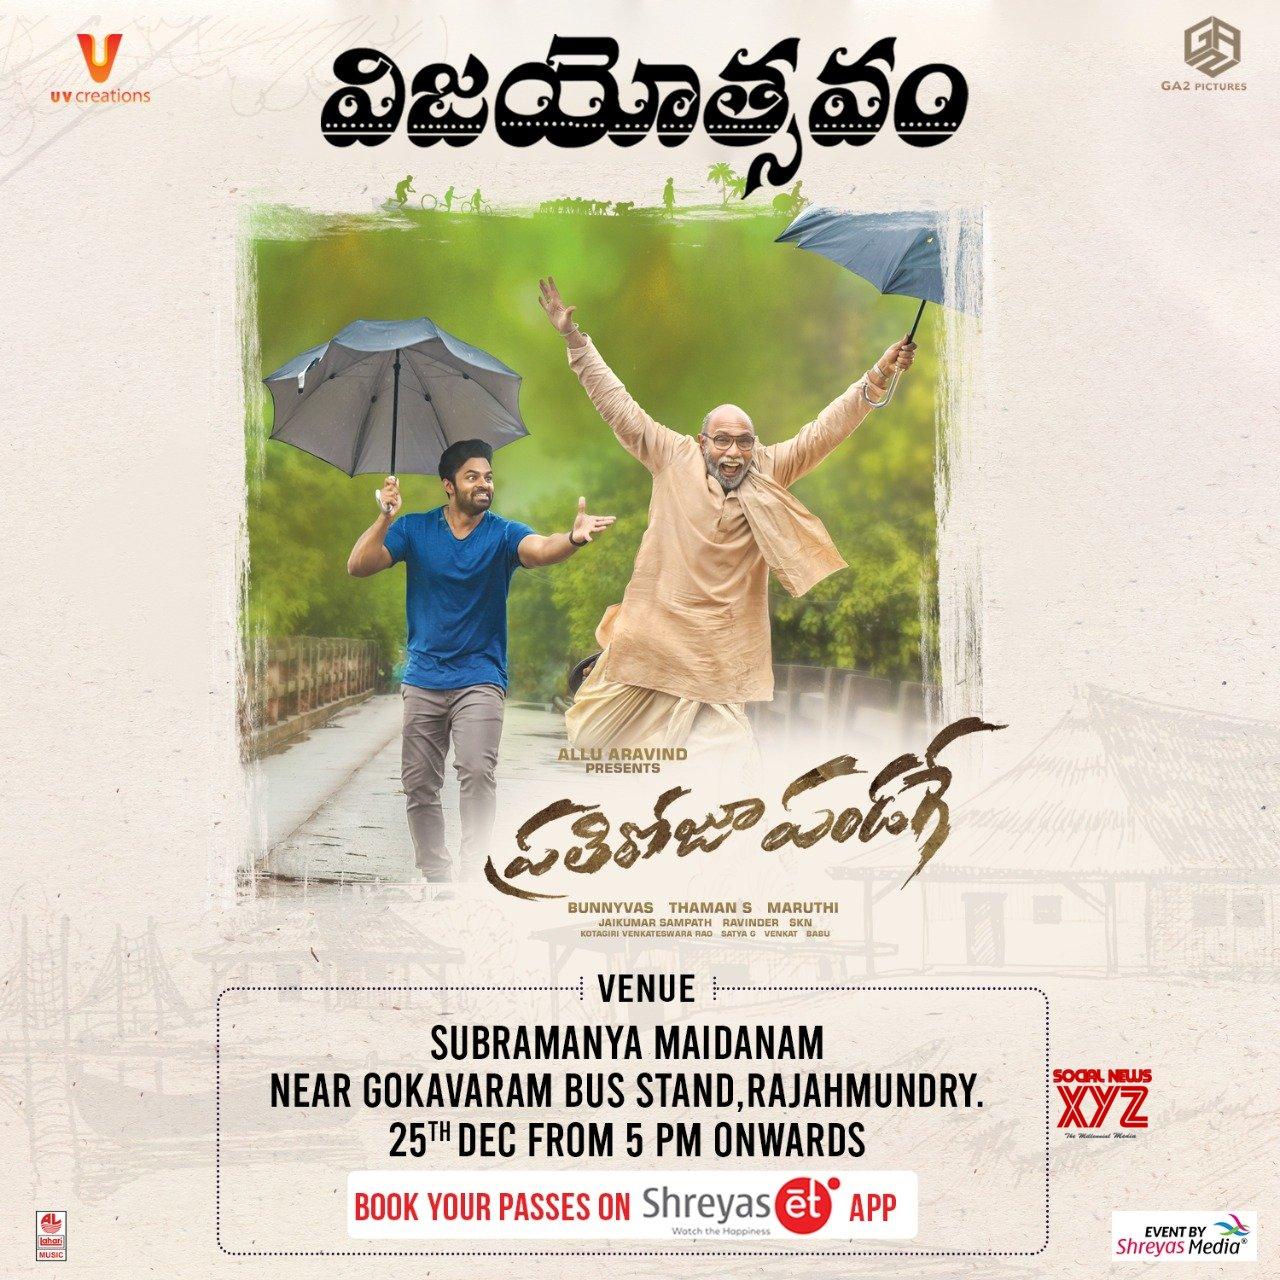 Prati Roju Pandaage Vijayotsavam Tomorrow At Subramanya Maidanam In Rajahmundry From 5 PM